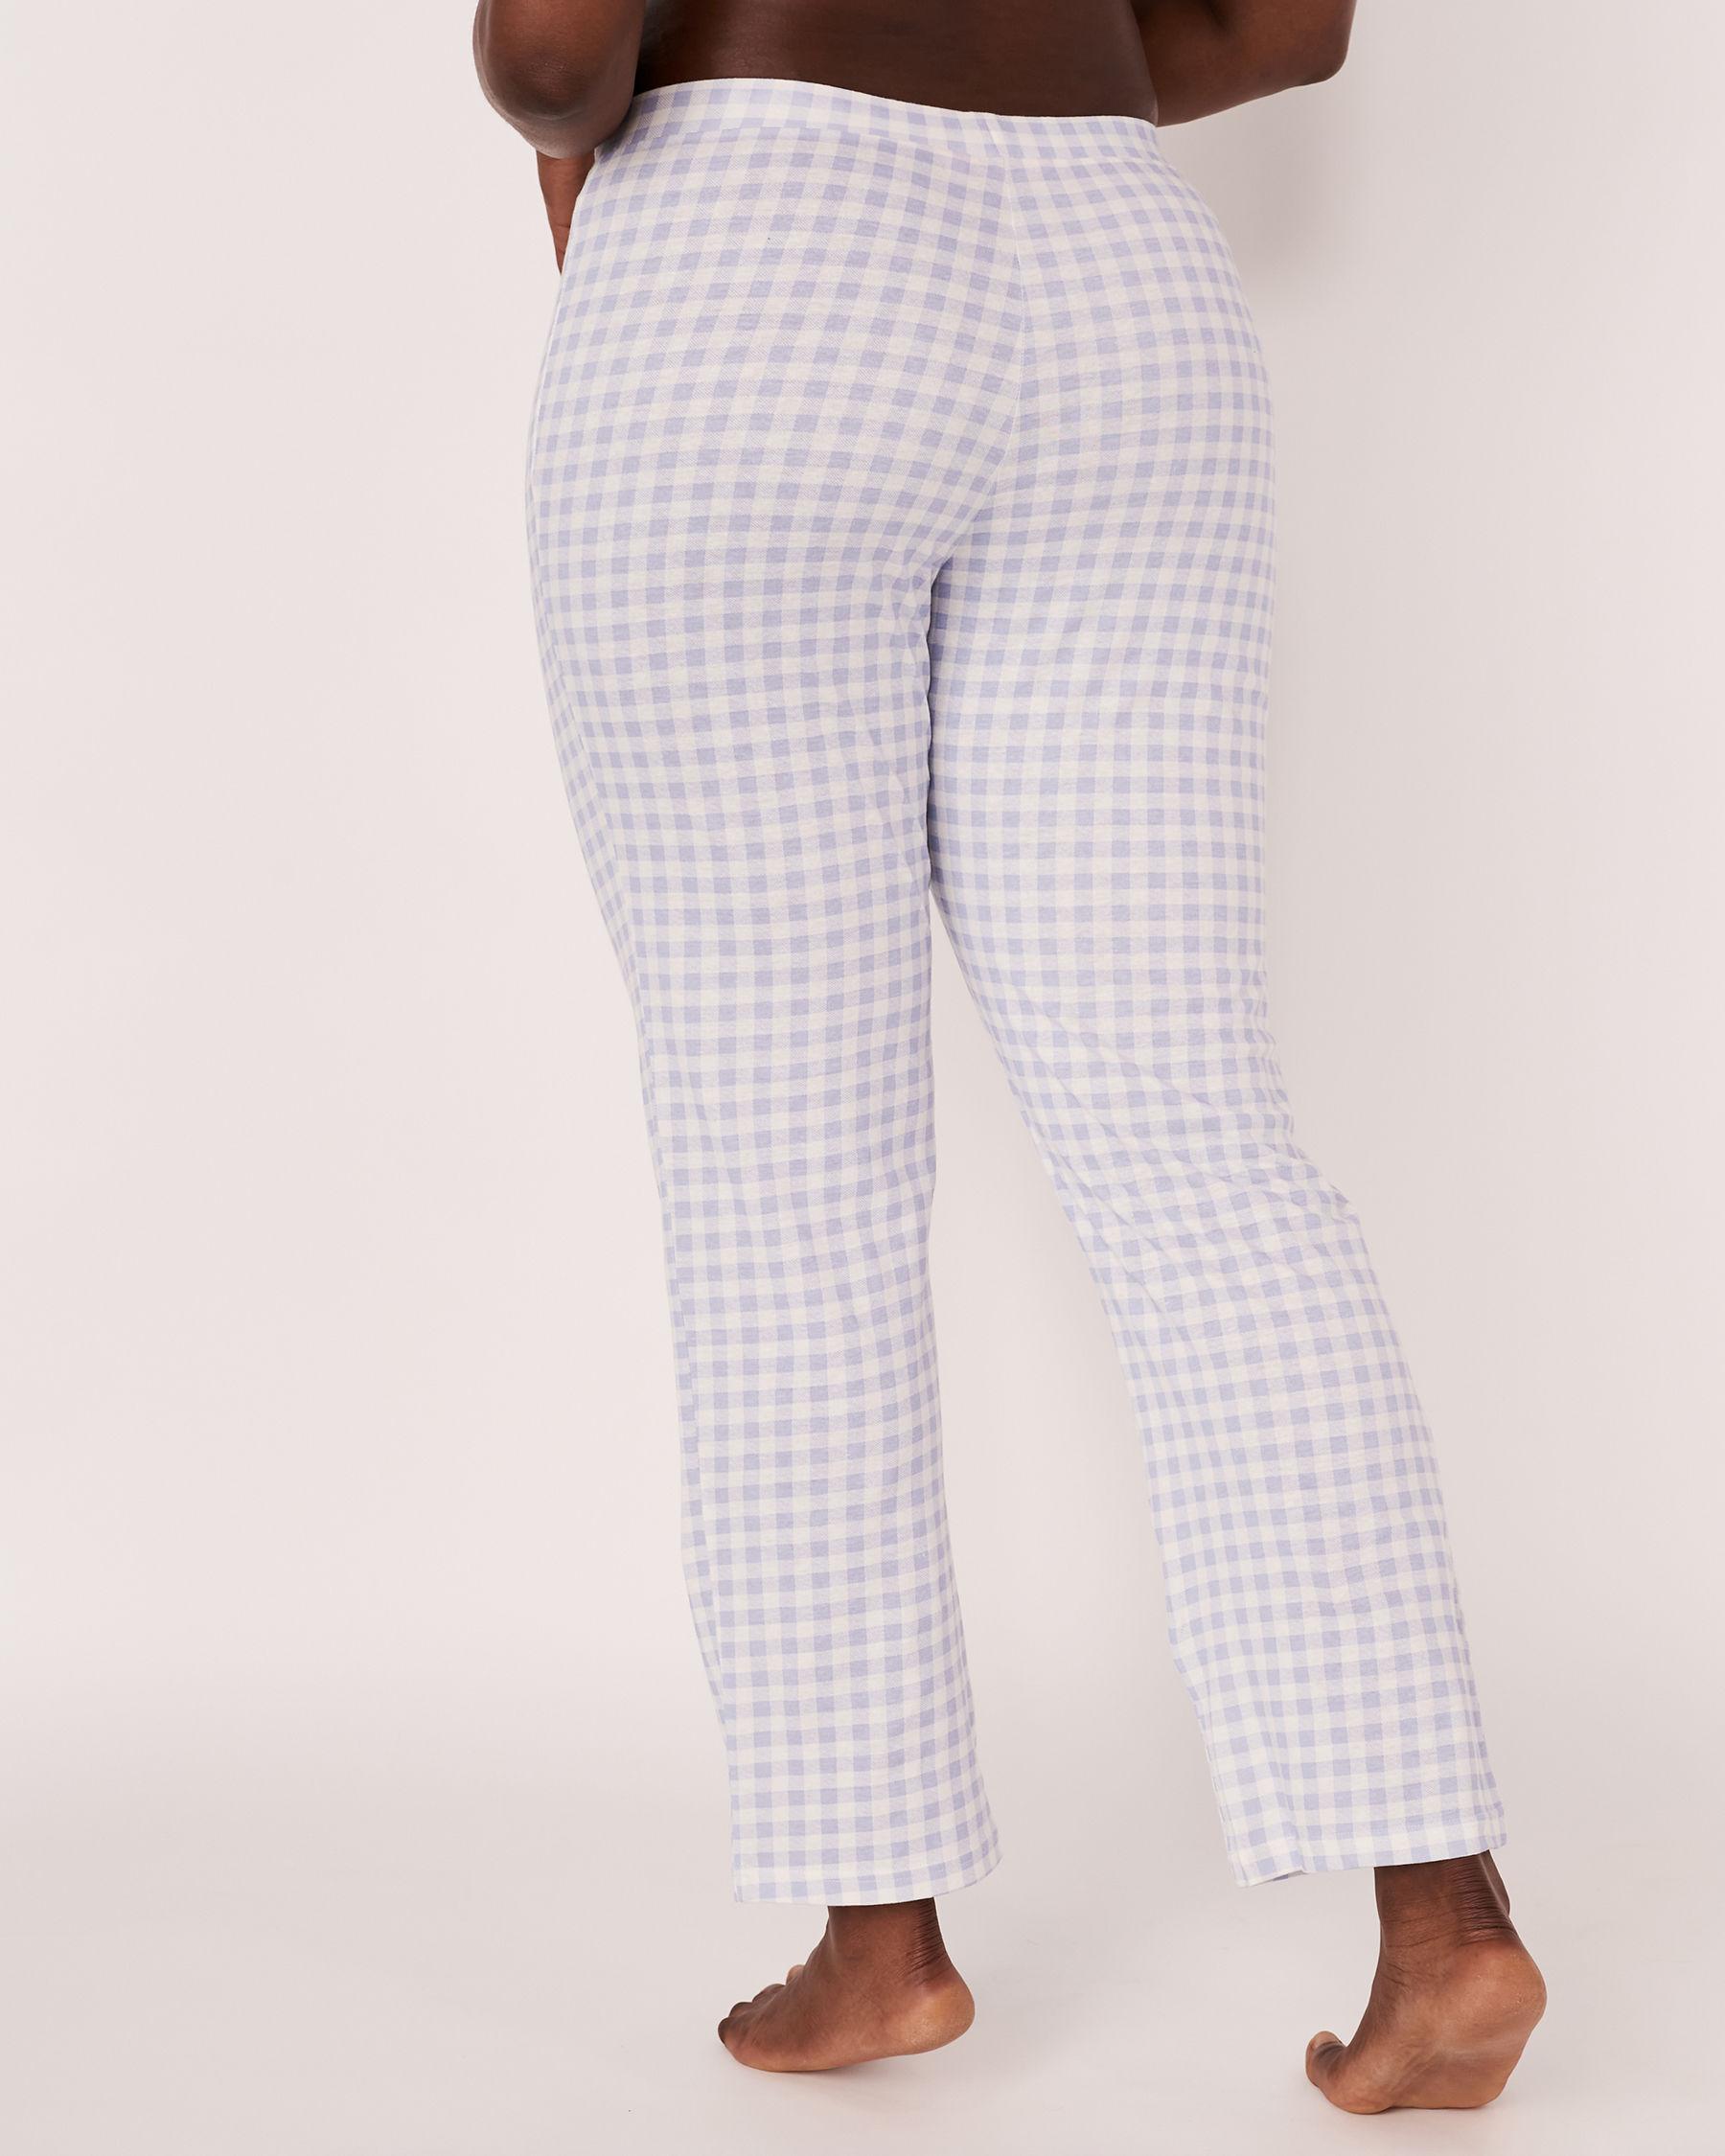 LA VIE EN ROSE Pyjama Pant with Drawstring Blue vichy 40200021 - View2